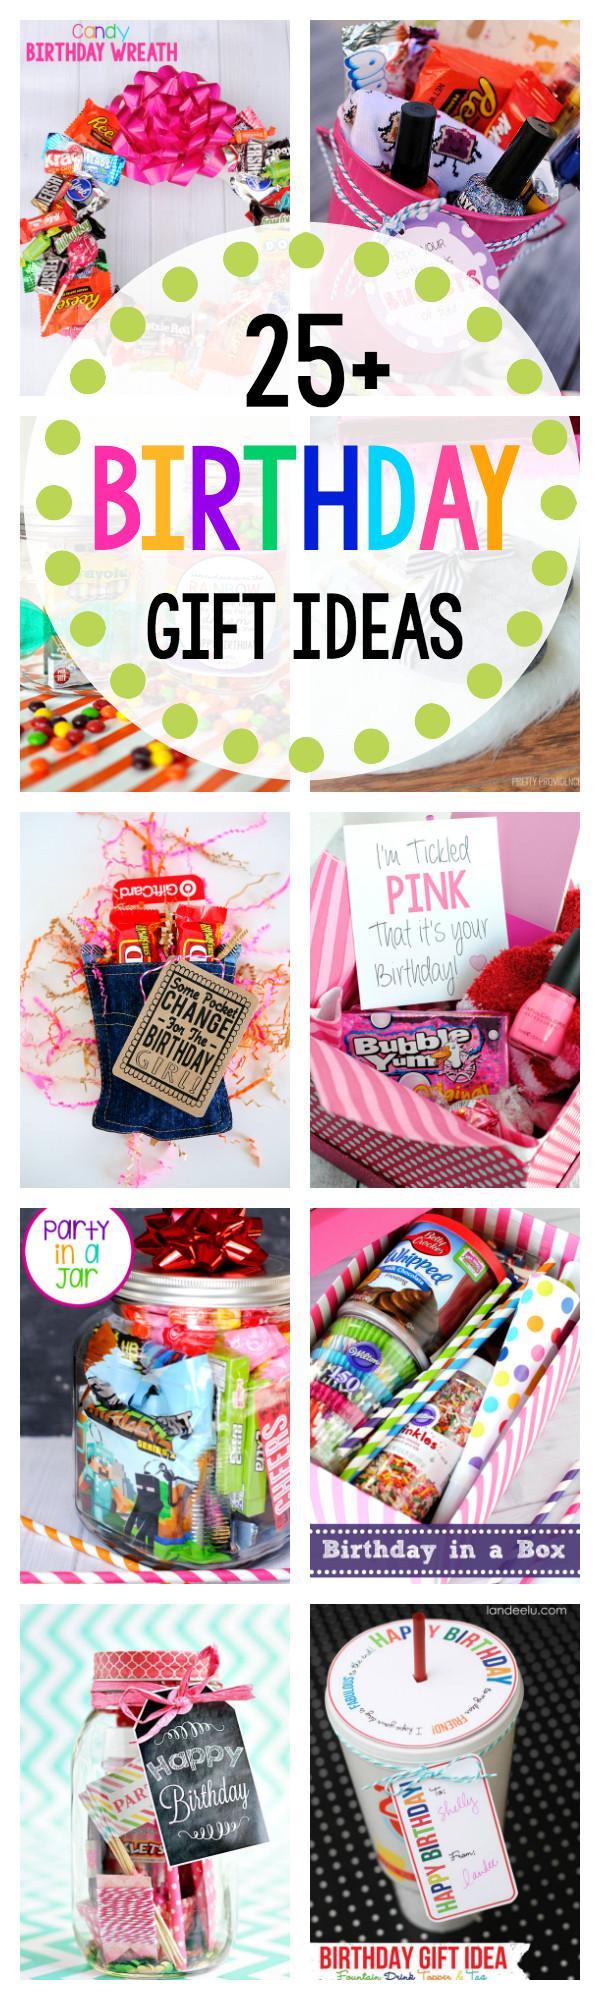 Anniversary Gift Ideas For Friends  Fun Birthday Gift Ideas for Friends Crazy Little Projects